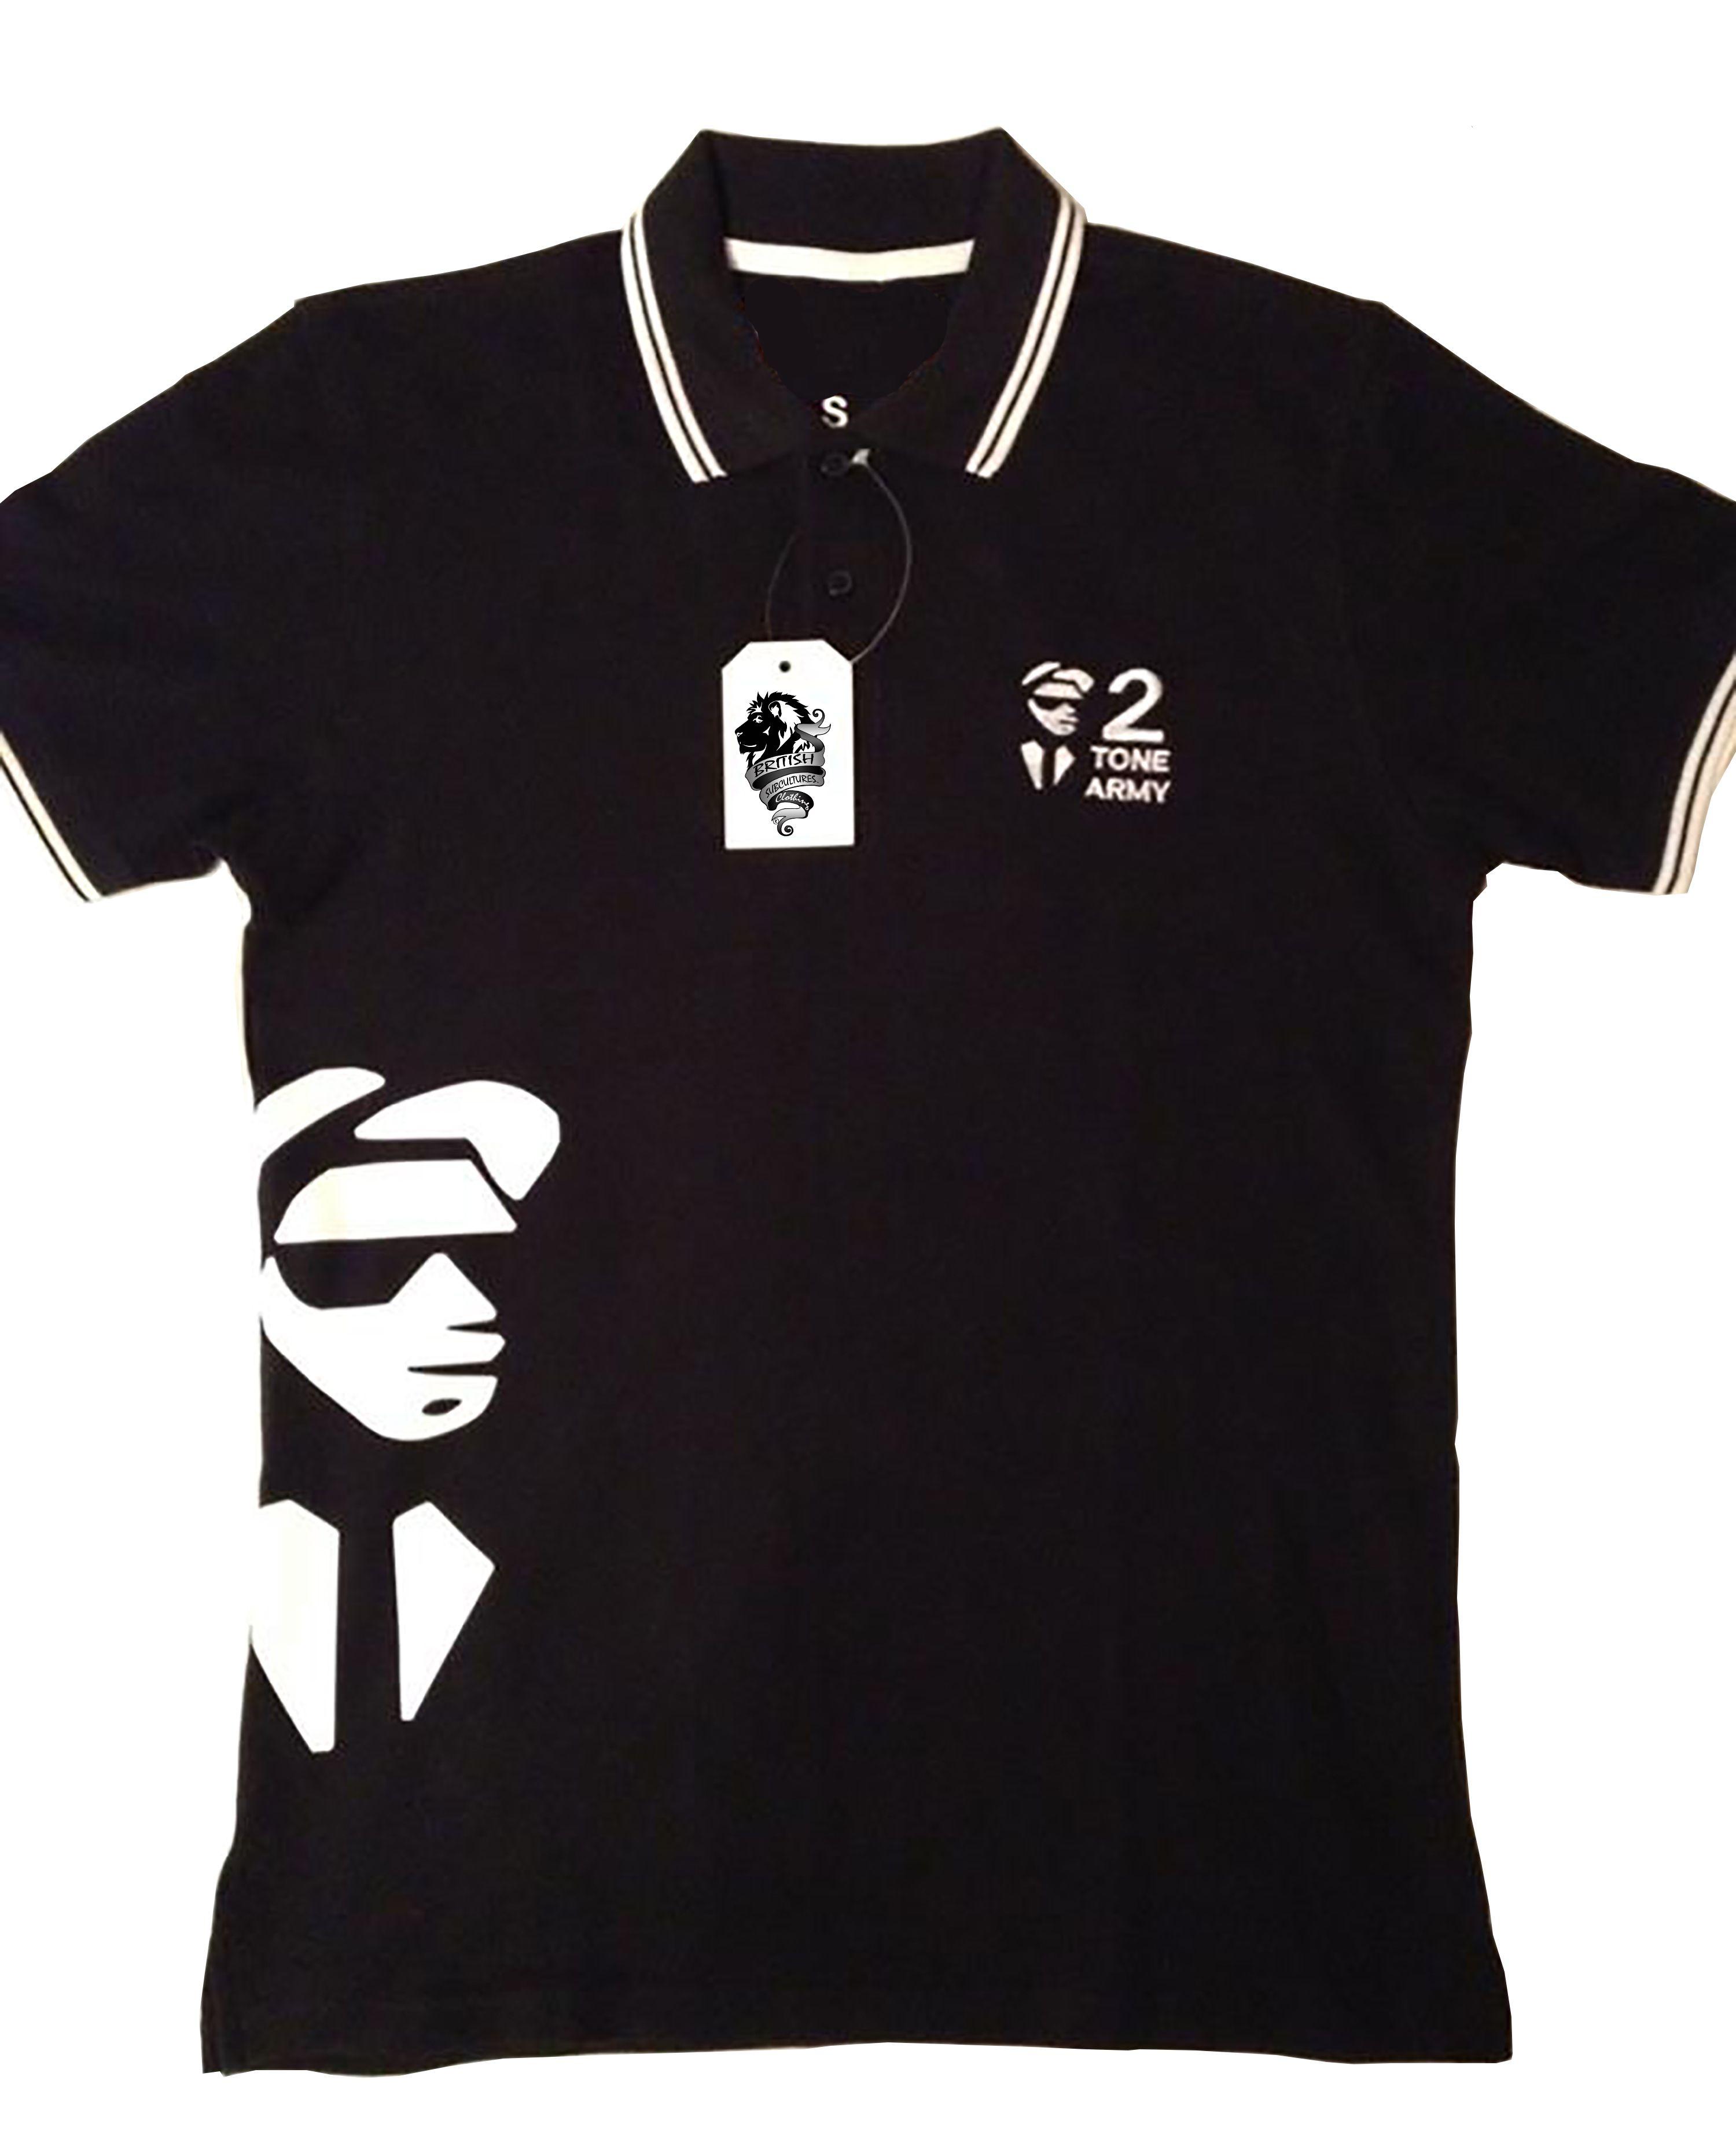 2 Tone Army Embroidered Printed Polo Shirt Ska Clothing Shirts